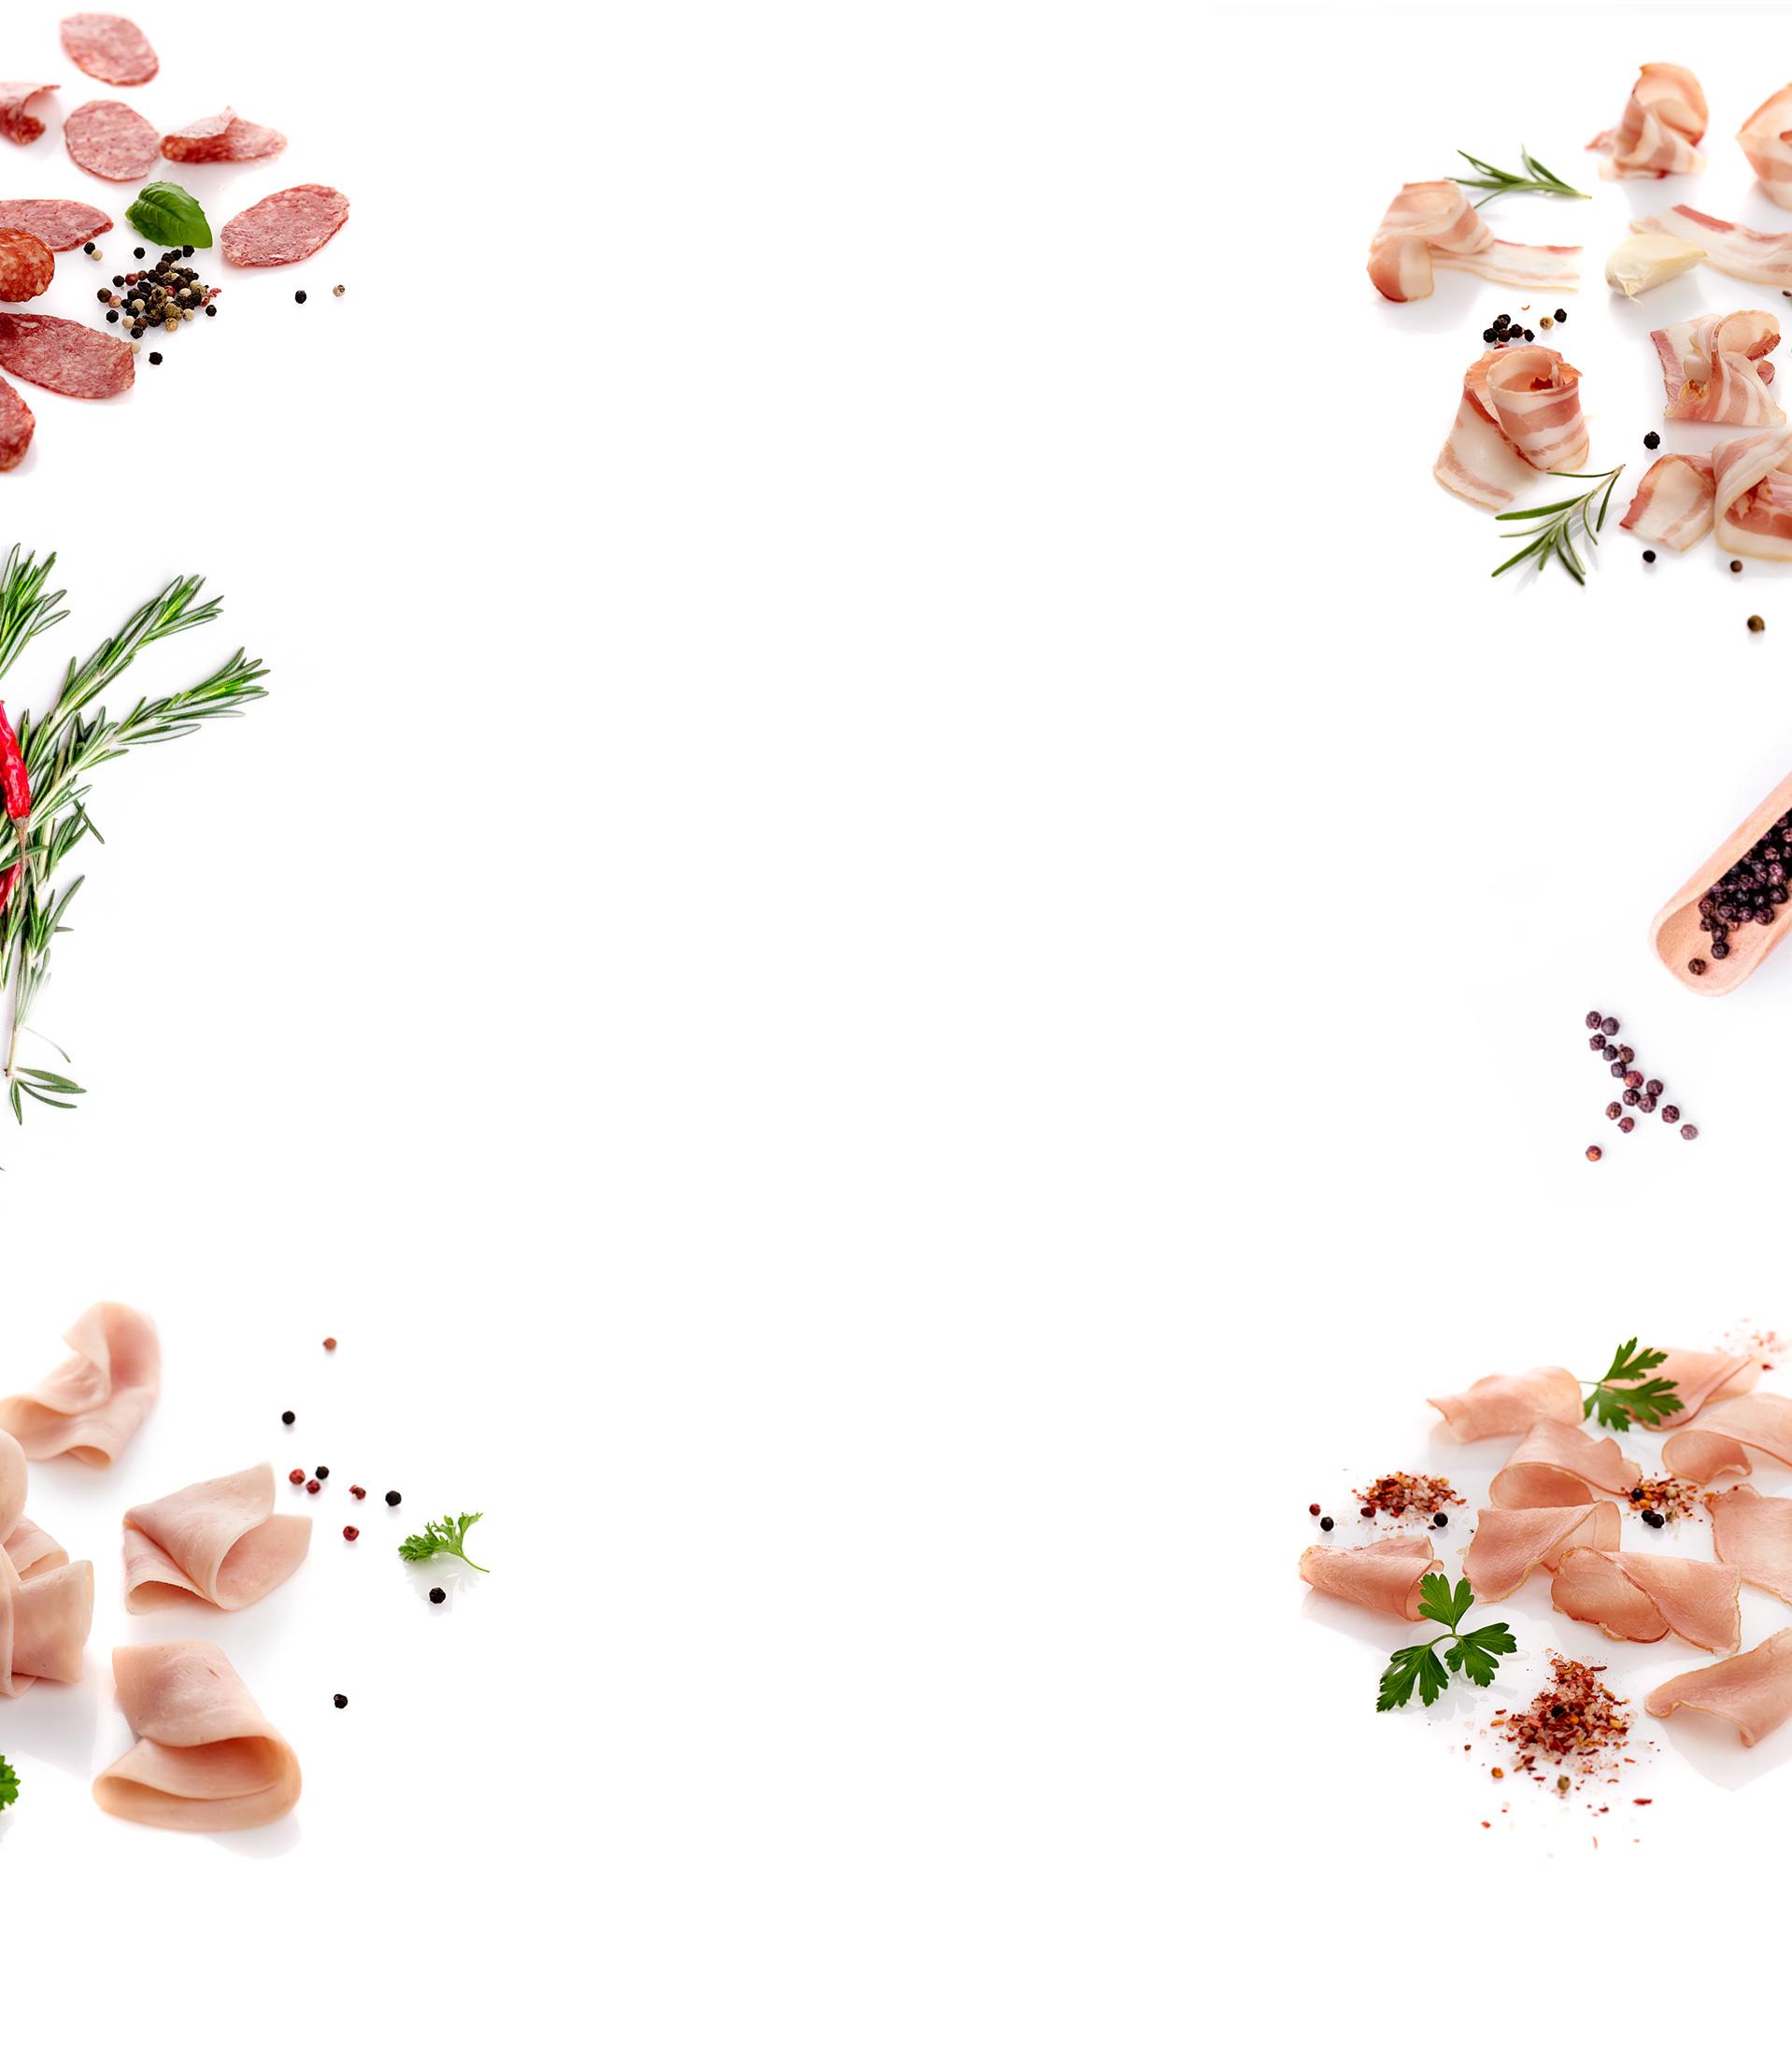 Carnex background image